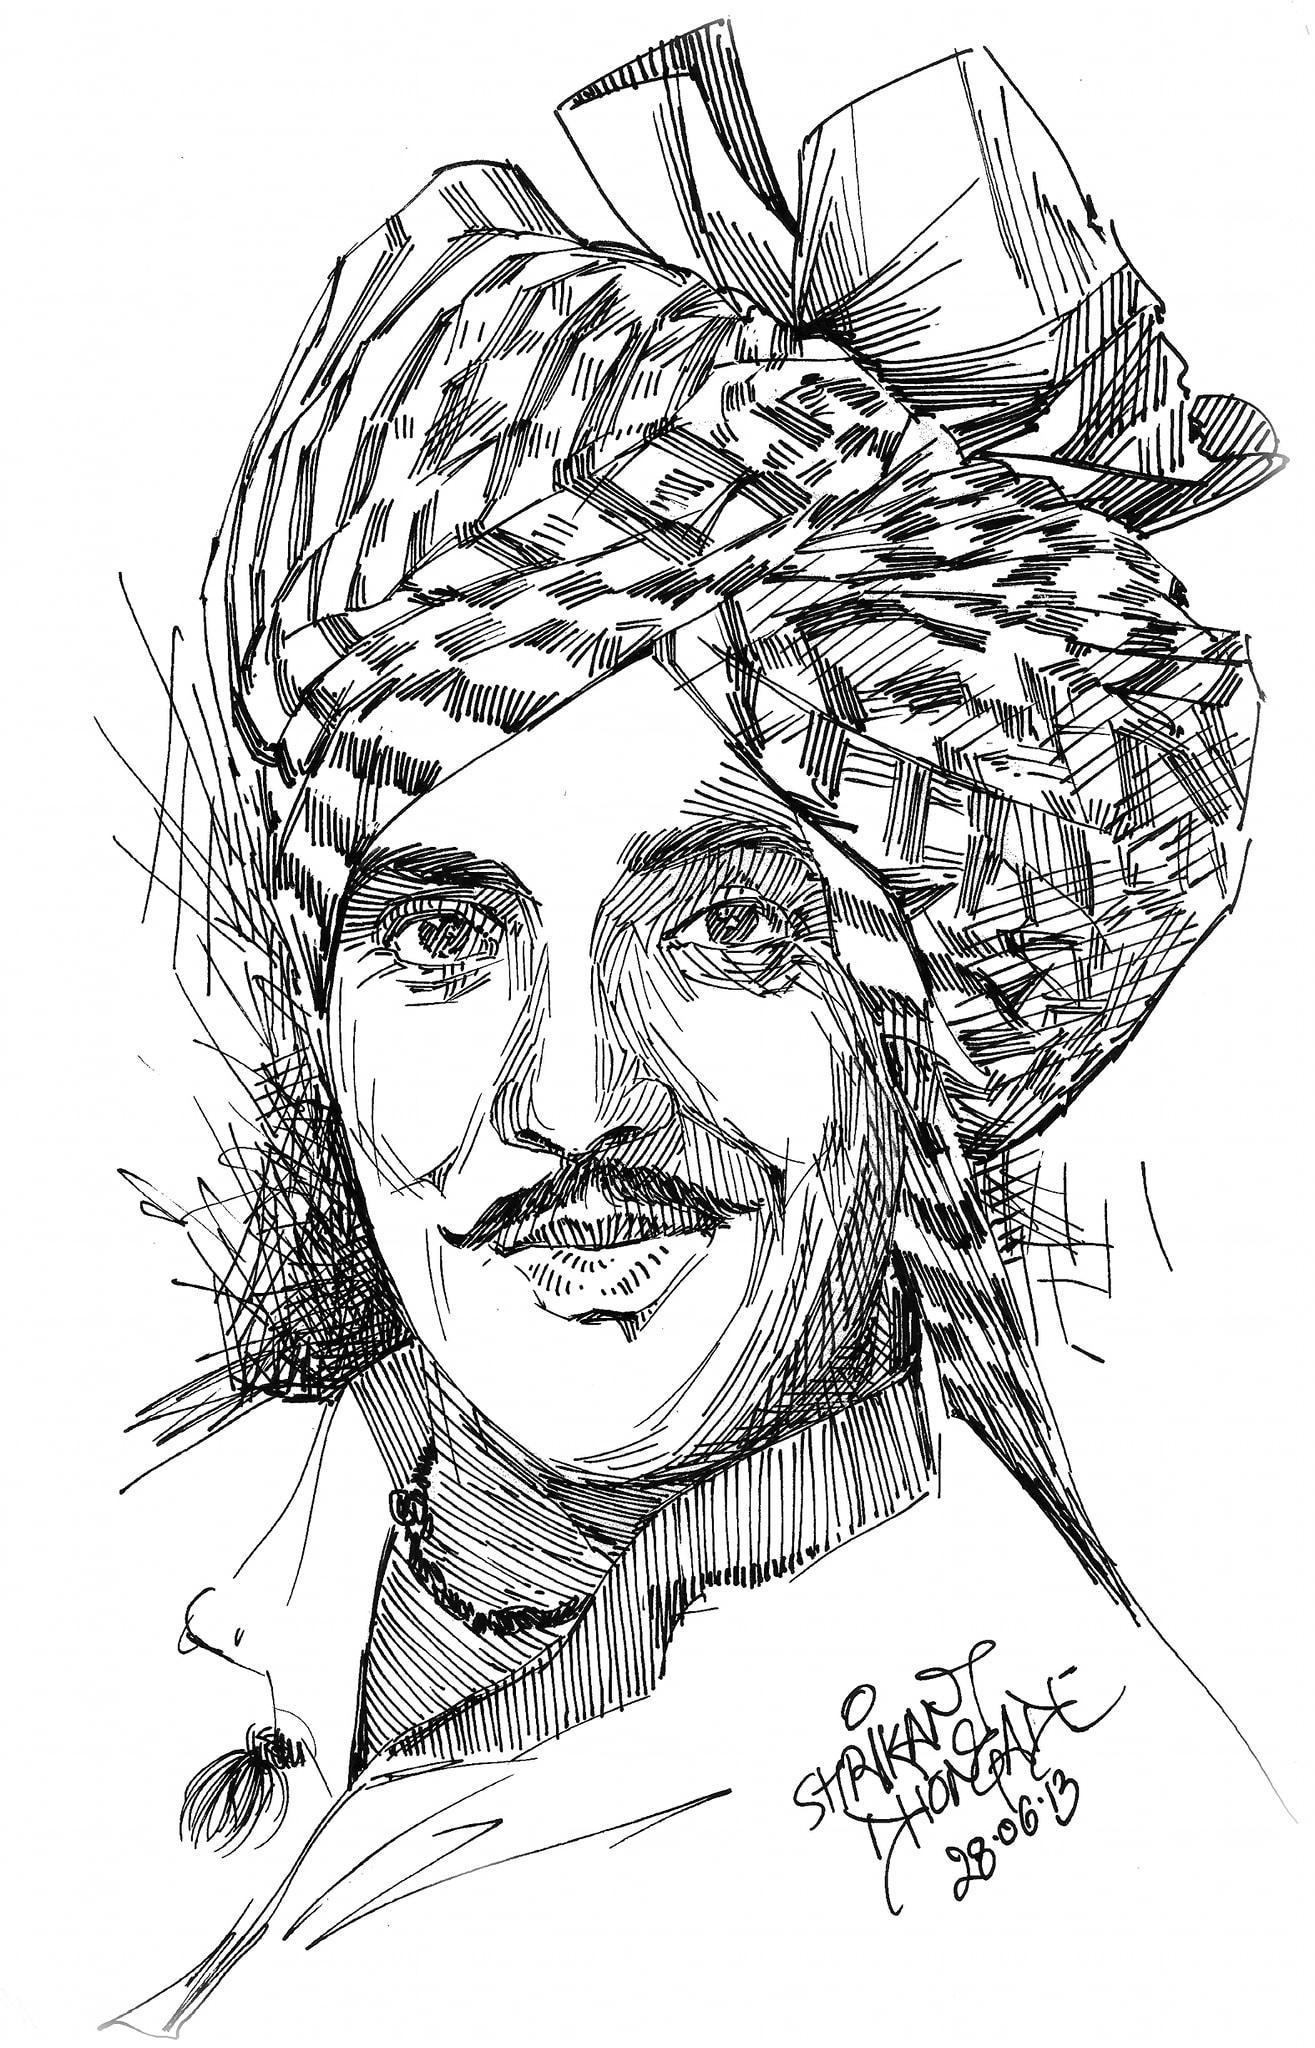 Vichha Majhi Puri Kara Legendary Actor Director of Marathi Cinema Dada Kondke